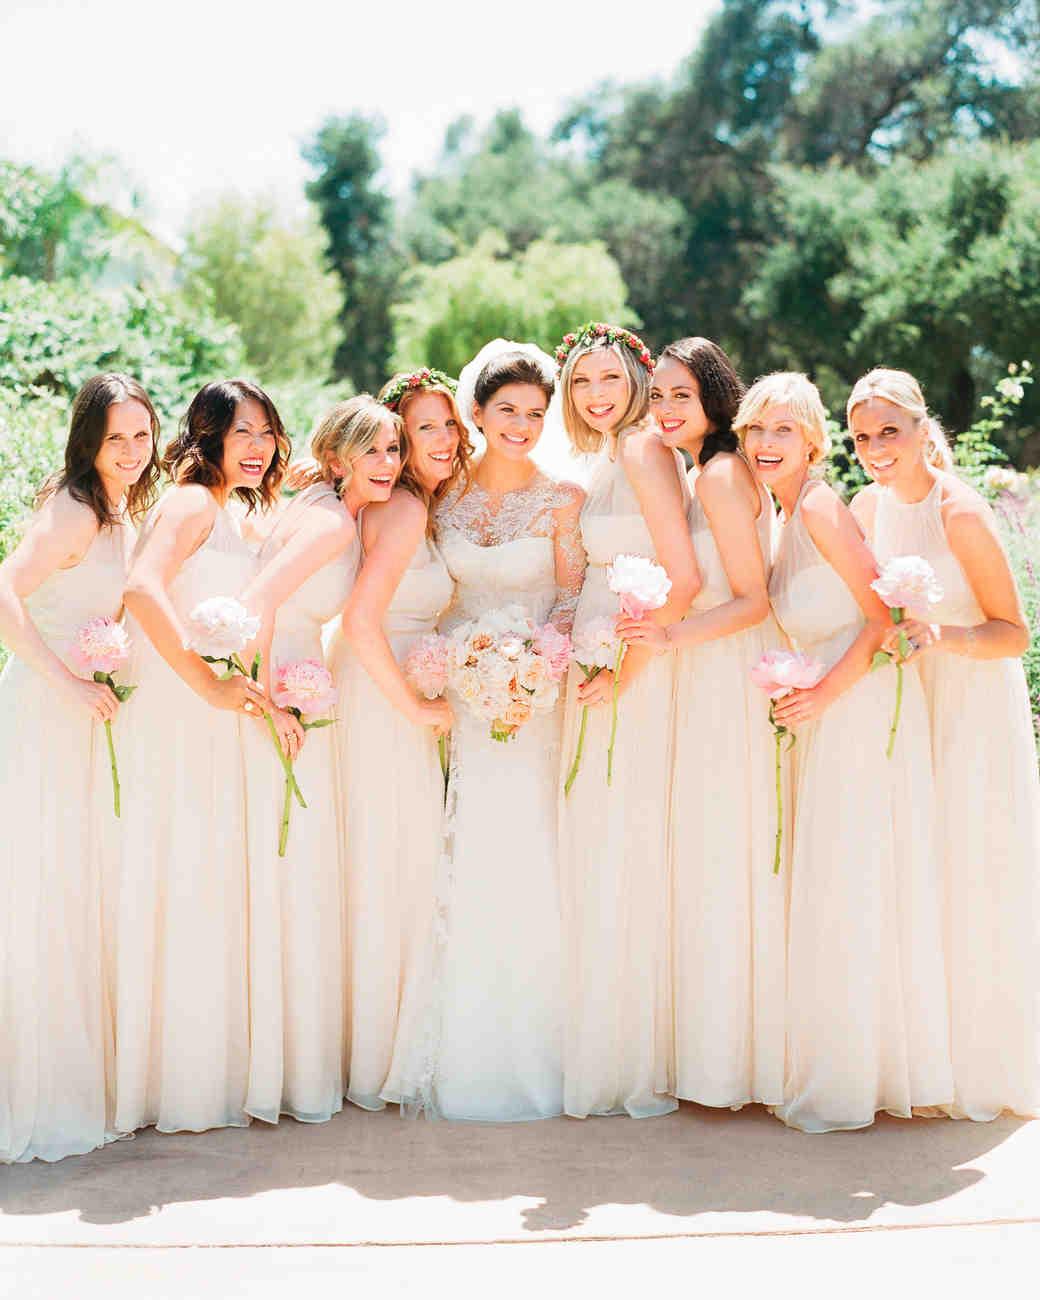 casey-david-wedding-ojai-0171-s111709.jpg